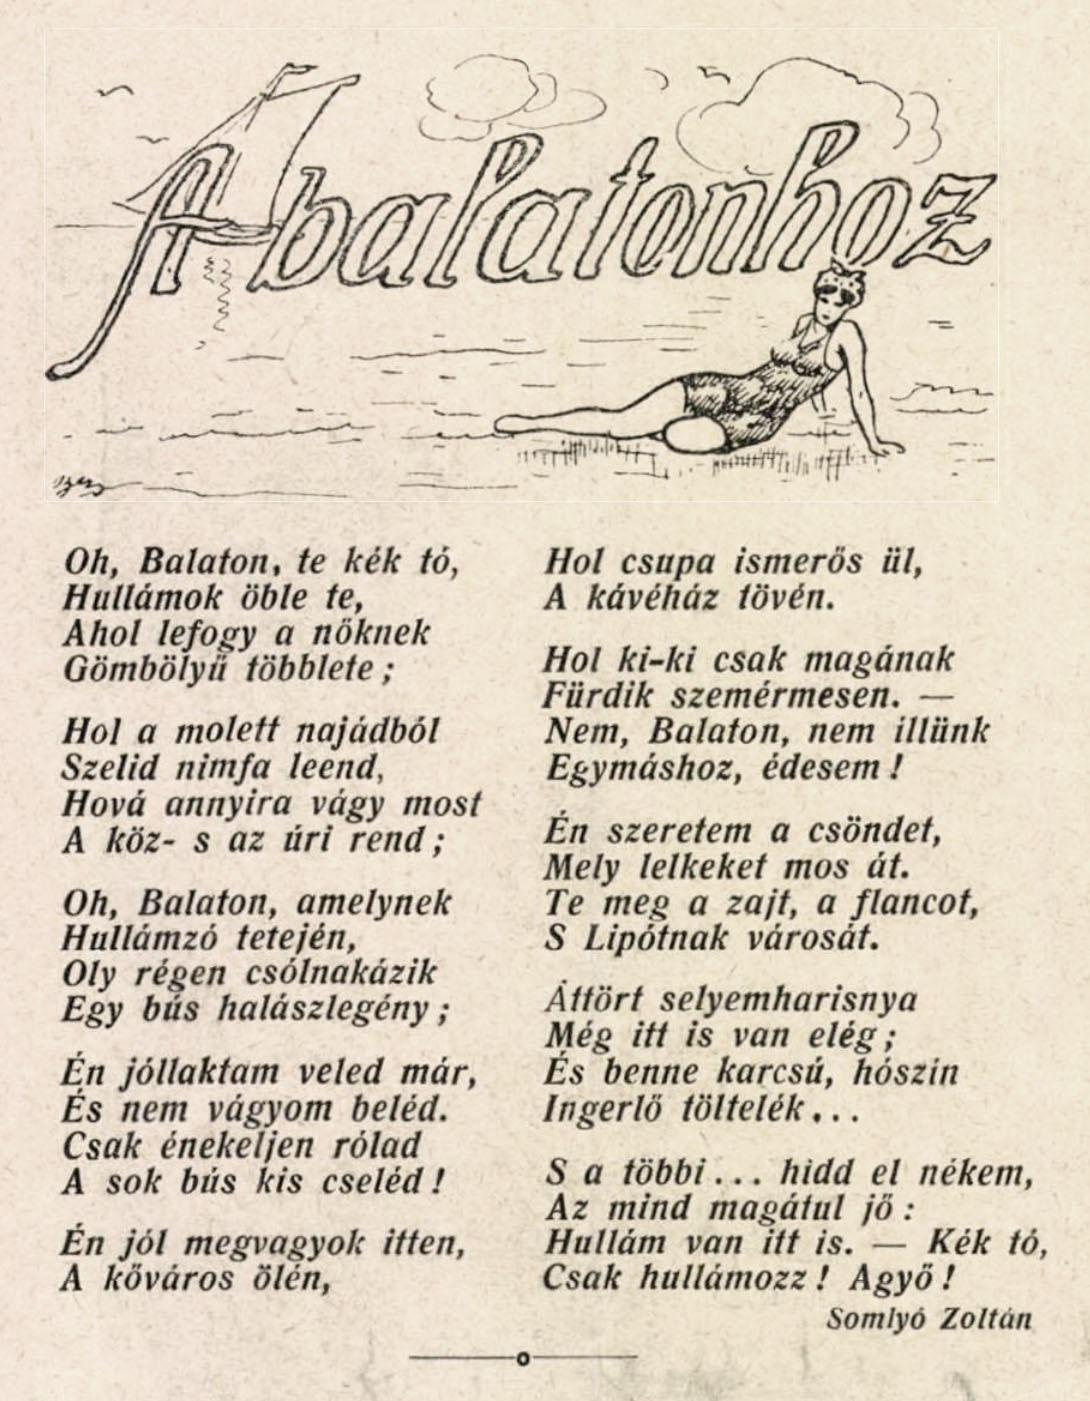 borsszemjanko_1918-1561146254_pages416-416.jpg